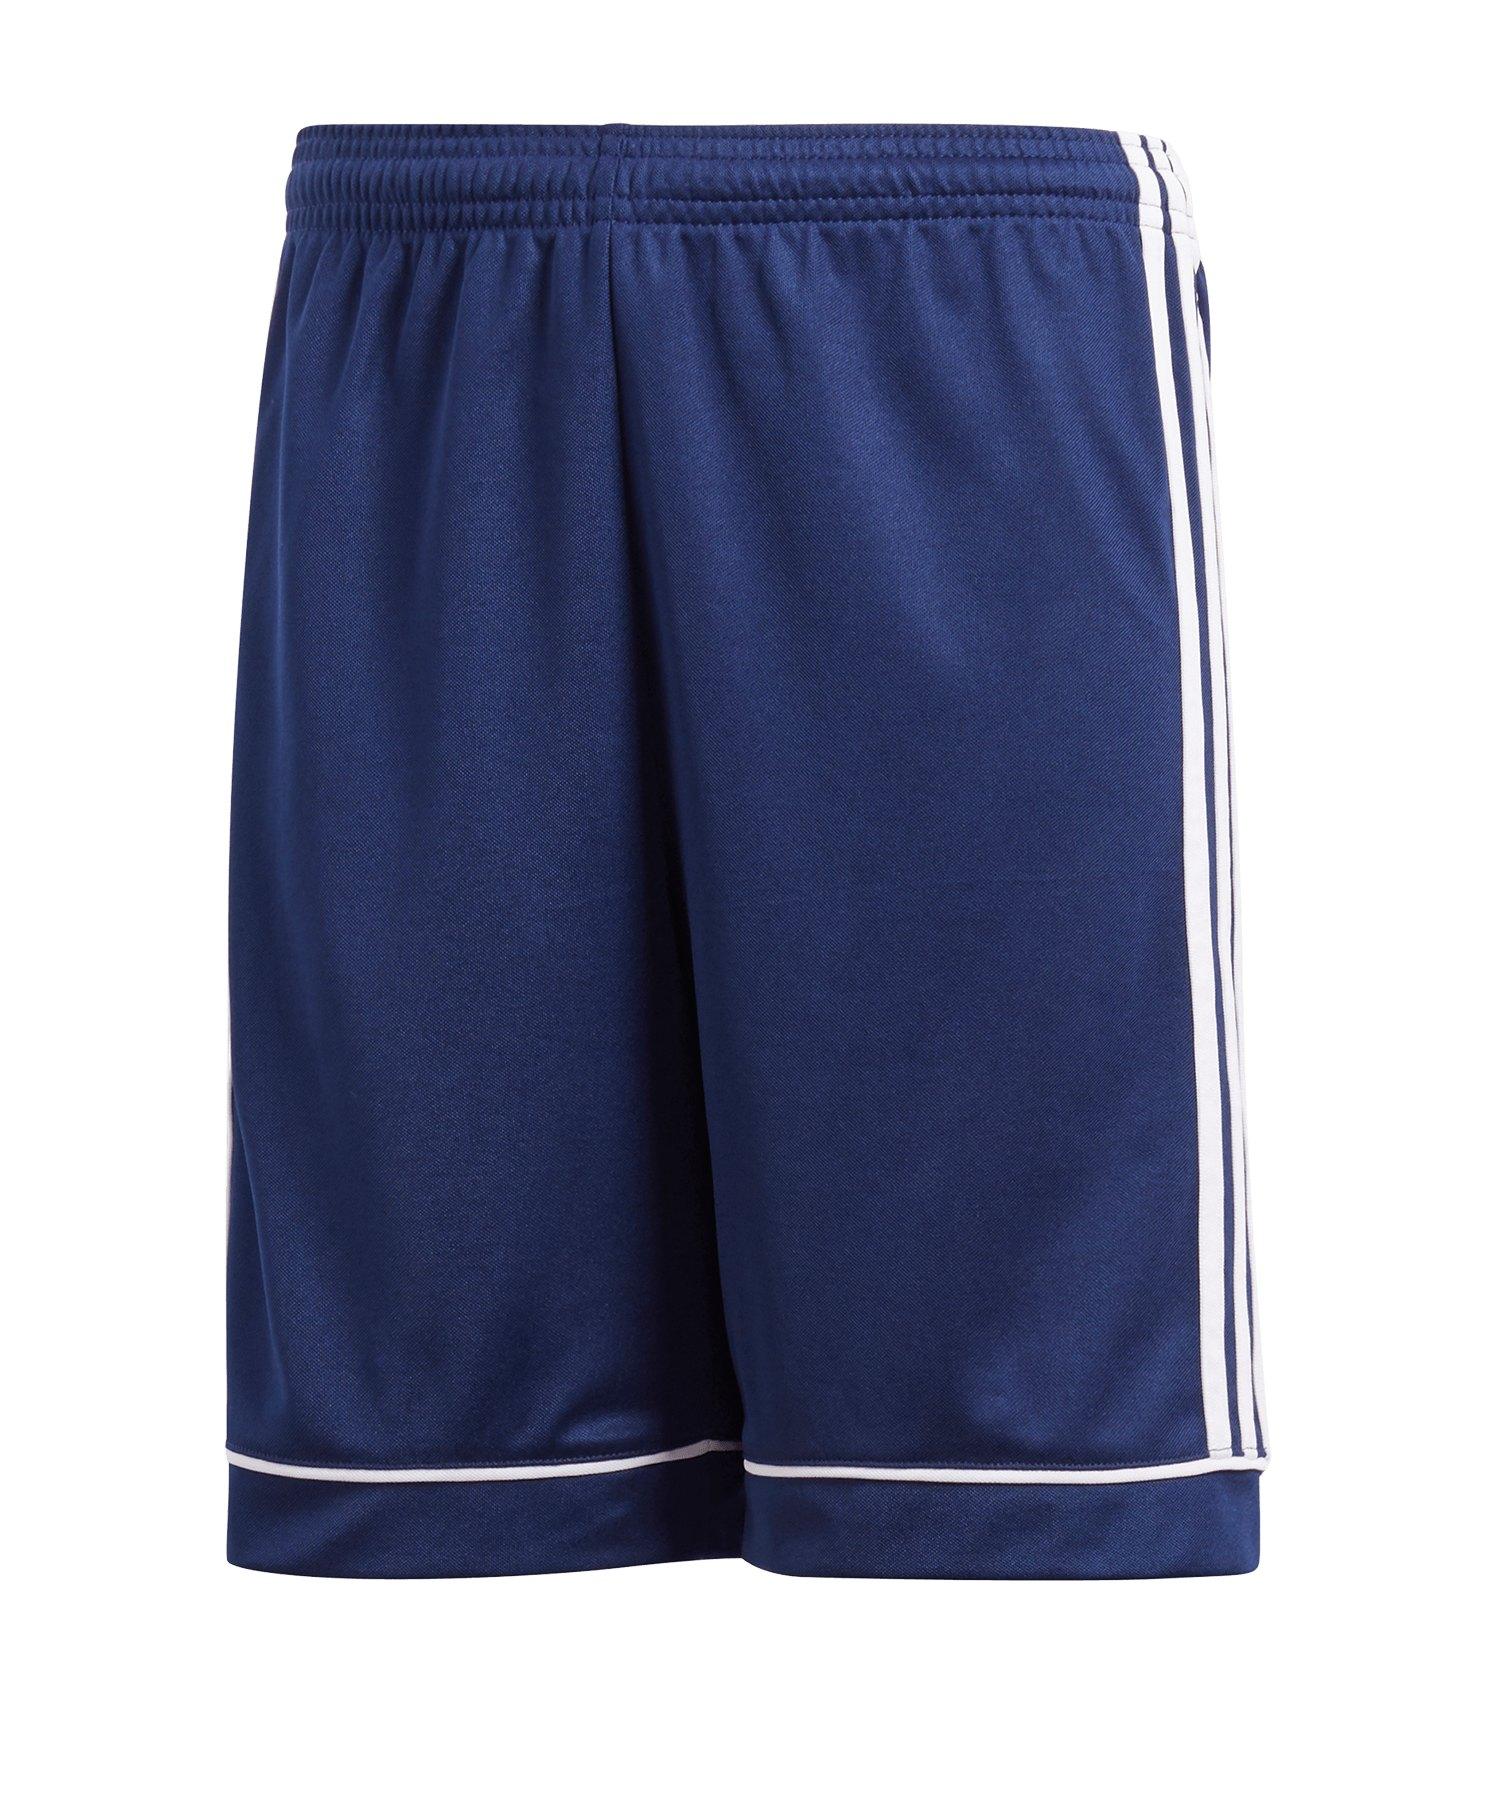 adidas Short Squadra 17 ohne Innenslip Blau Weiss - blau